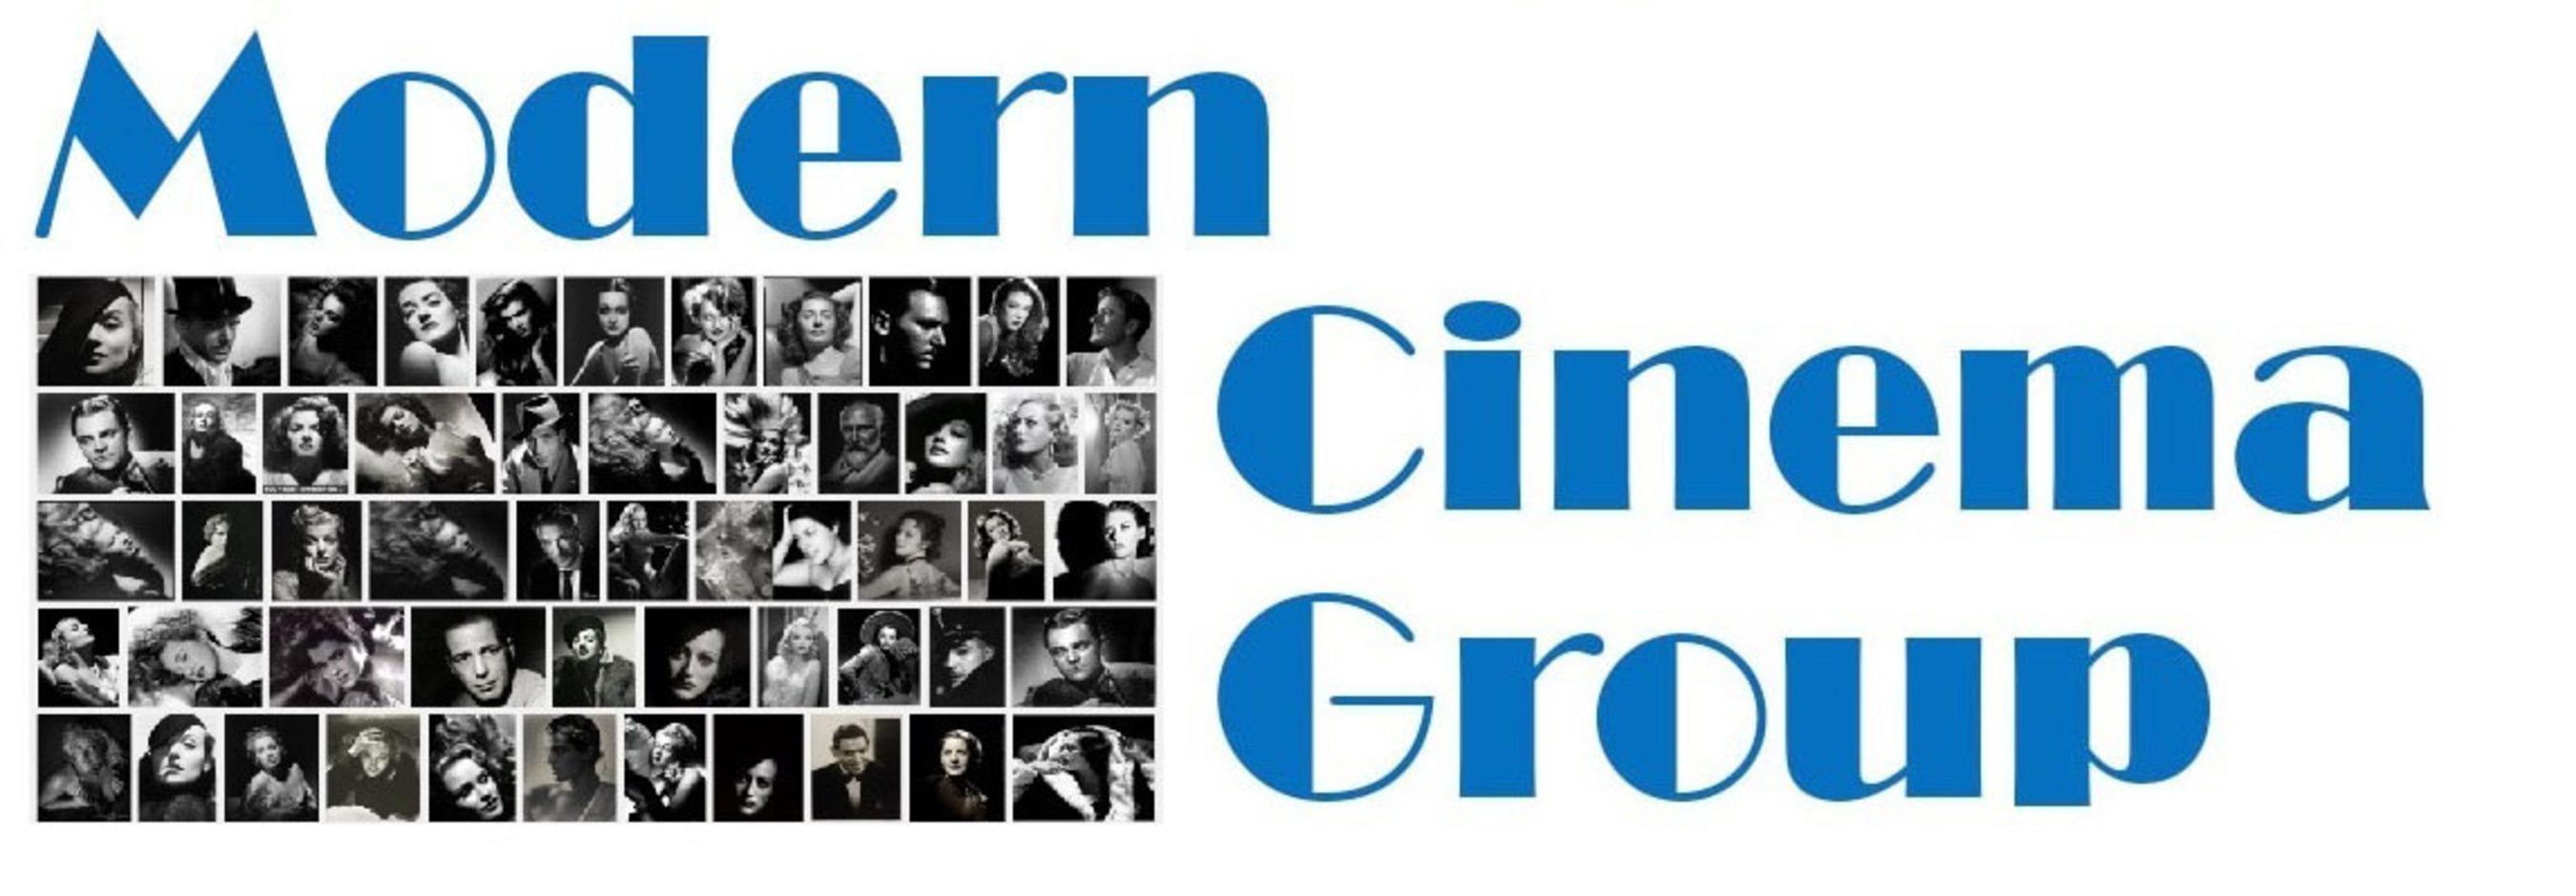 Modern Cinema Group Logo